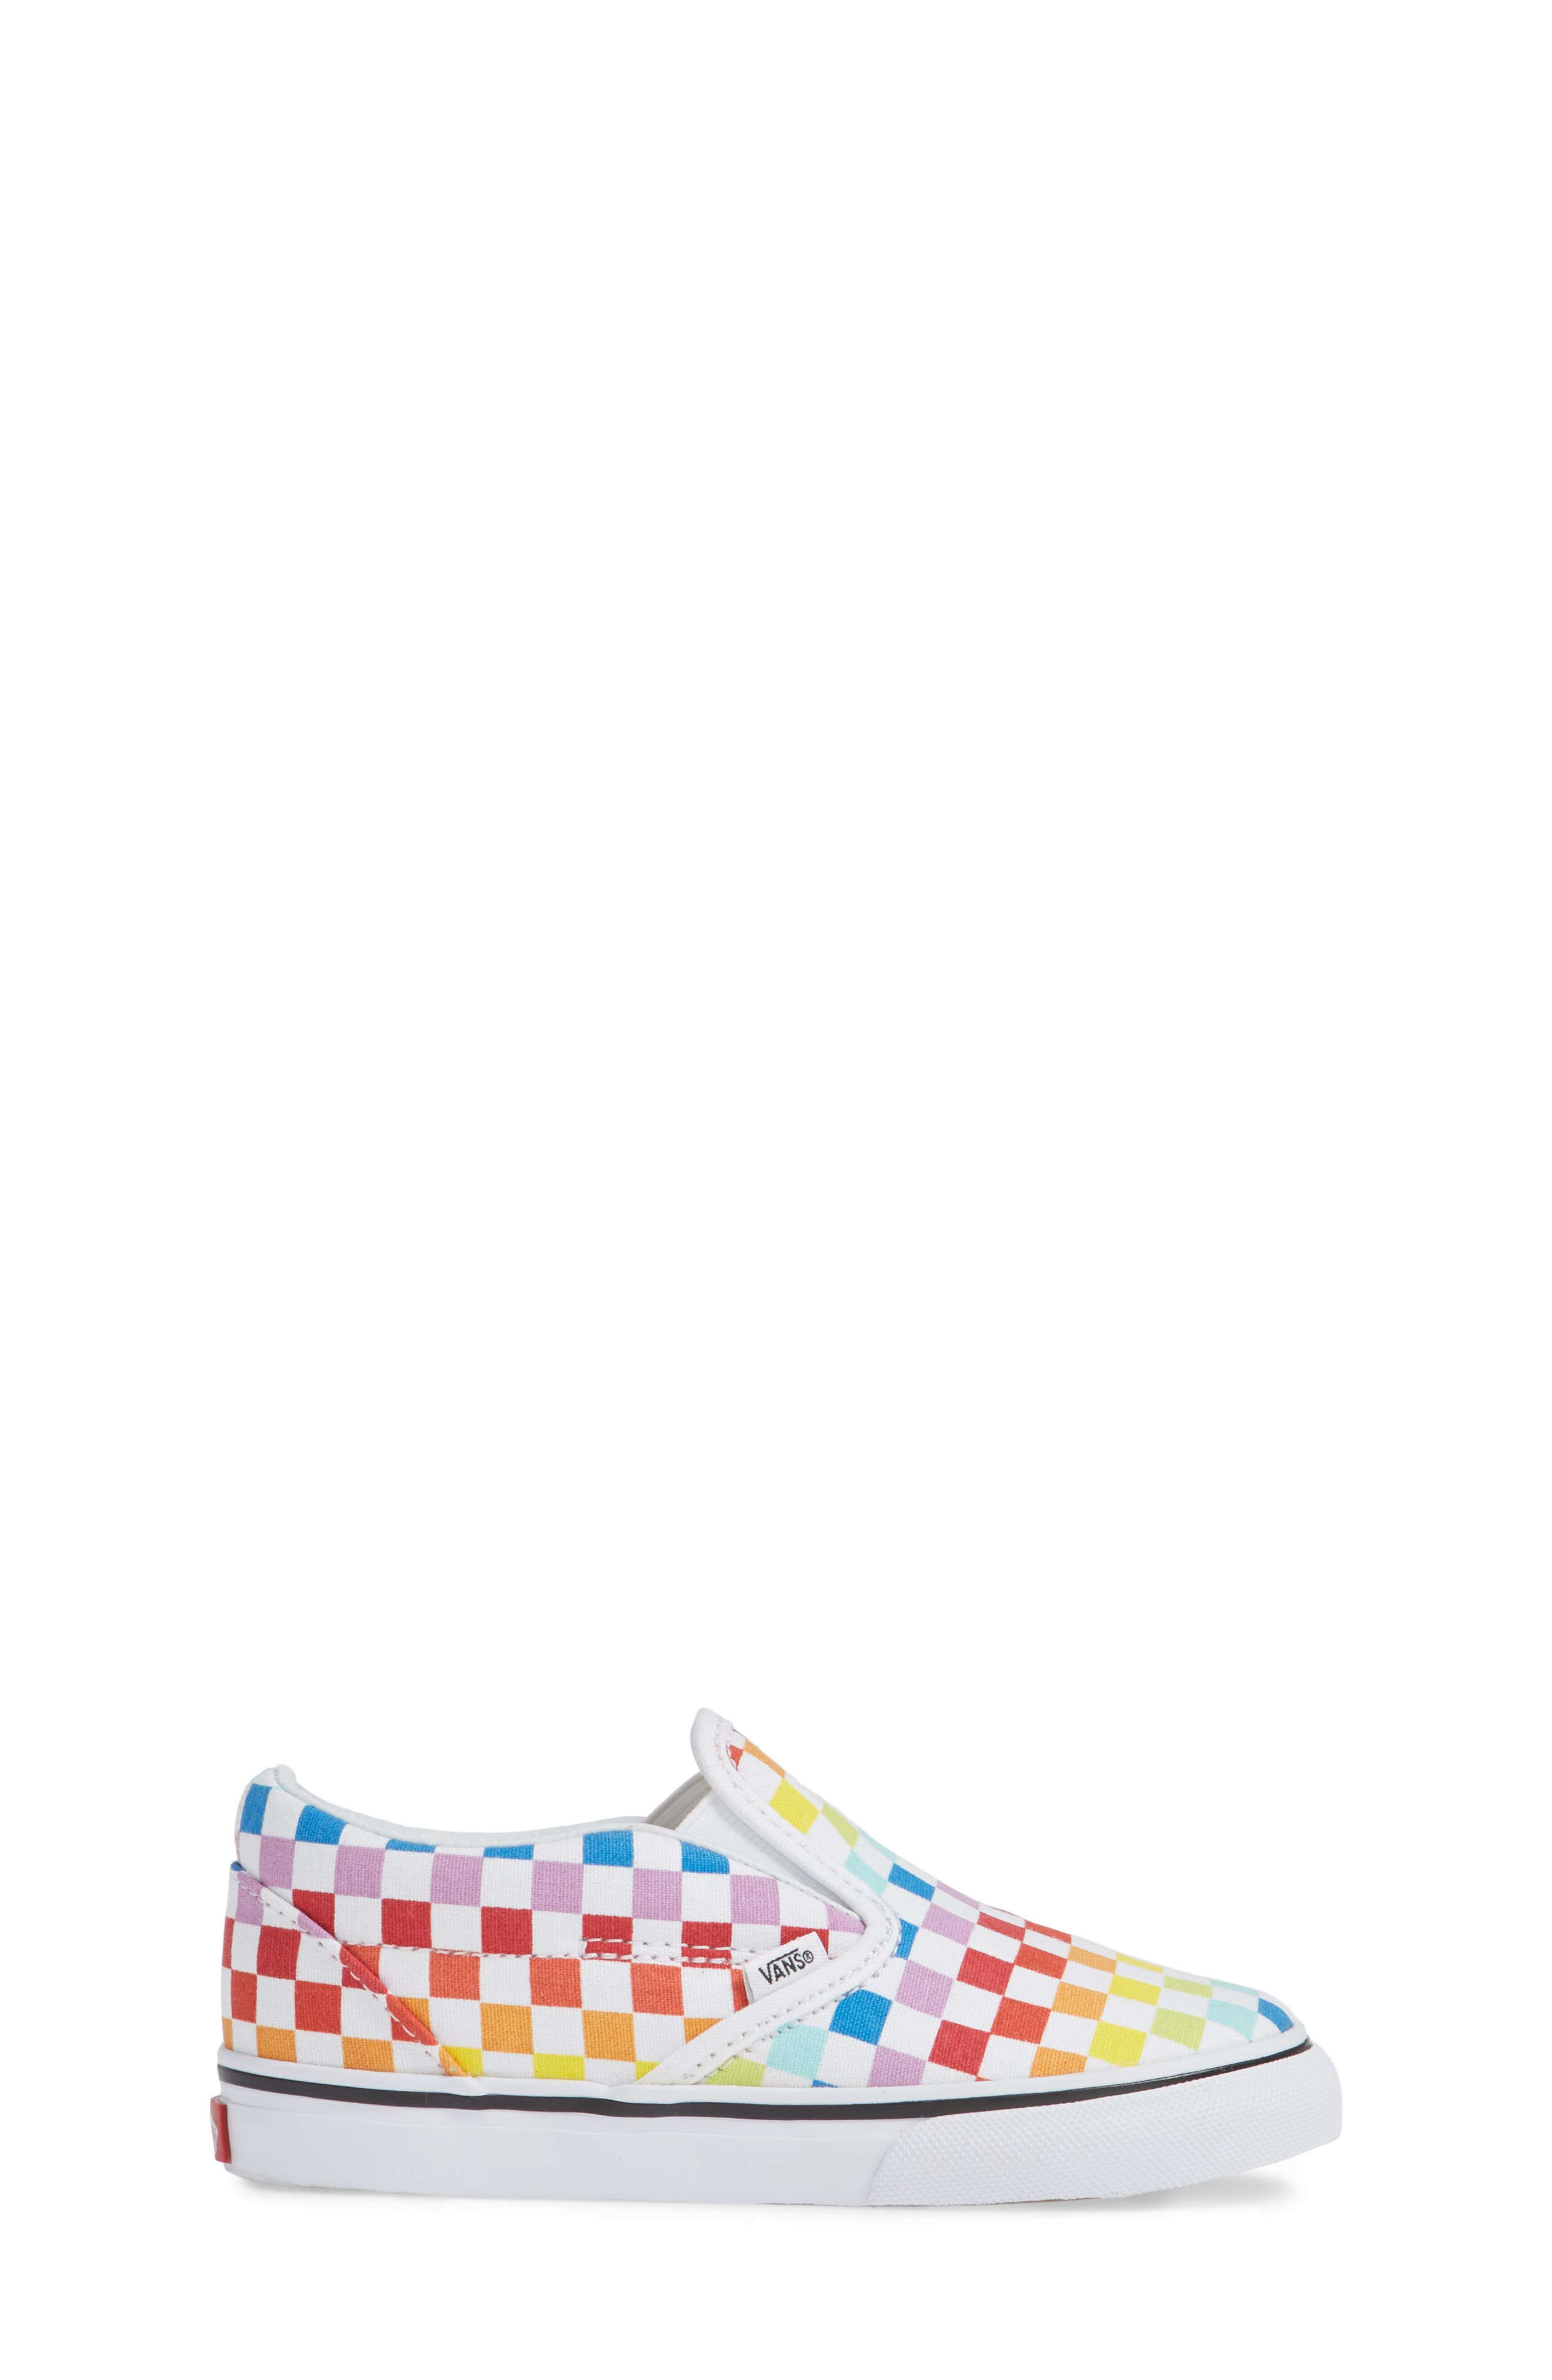 'Classic - Checker' Slip-On,                             Alternate thumbnail 3, color,                             RAINBOW/ WHITE